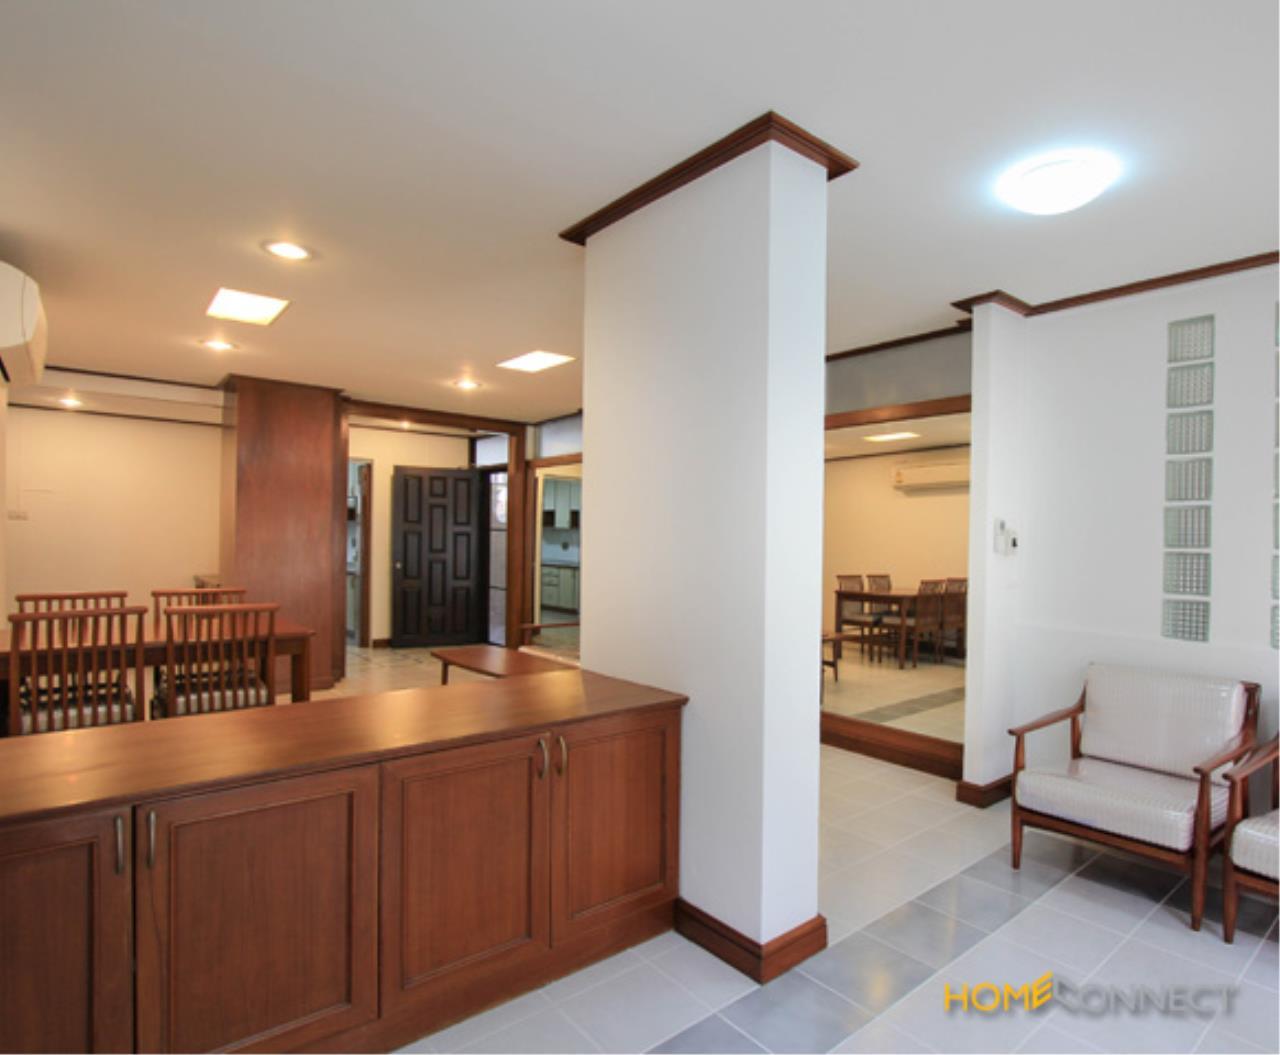 Home Connect Thailand Agency's C.S Villa Condominium for Rent 5